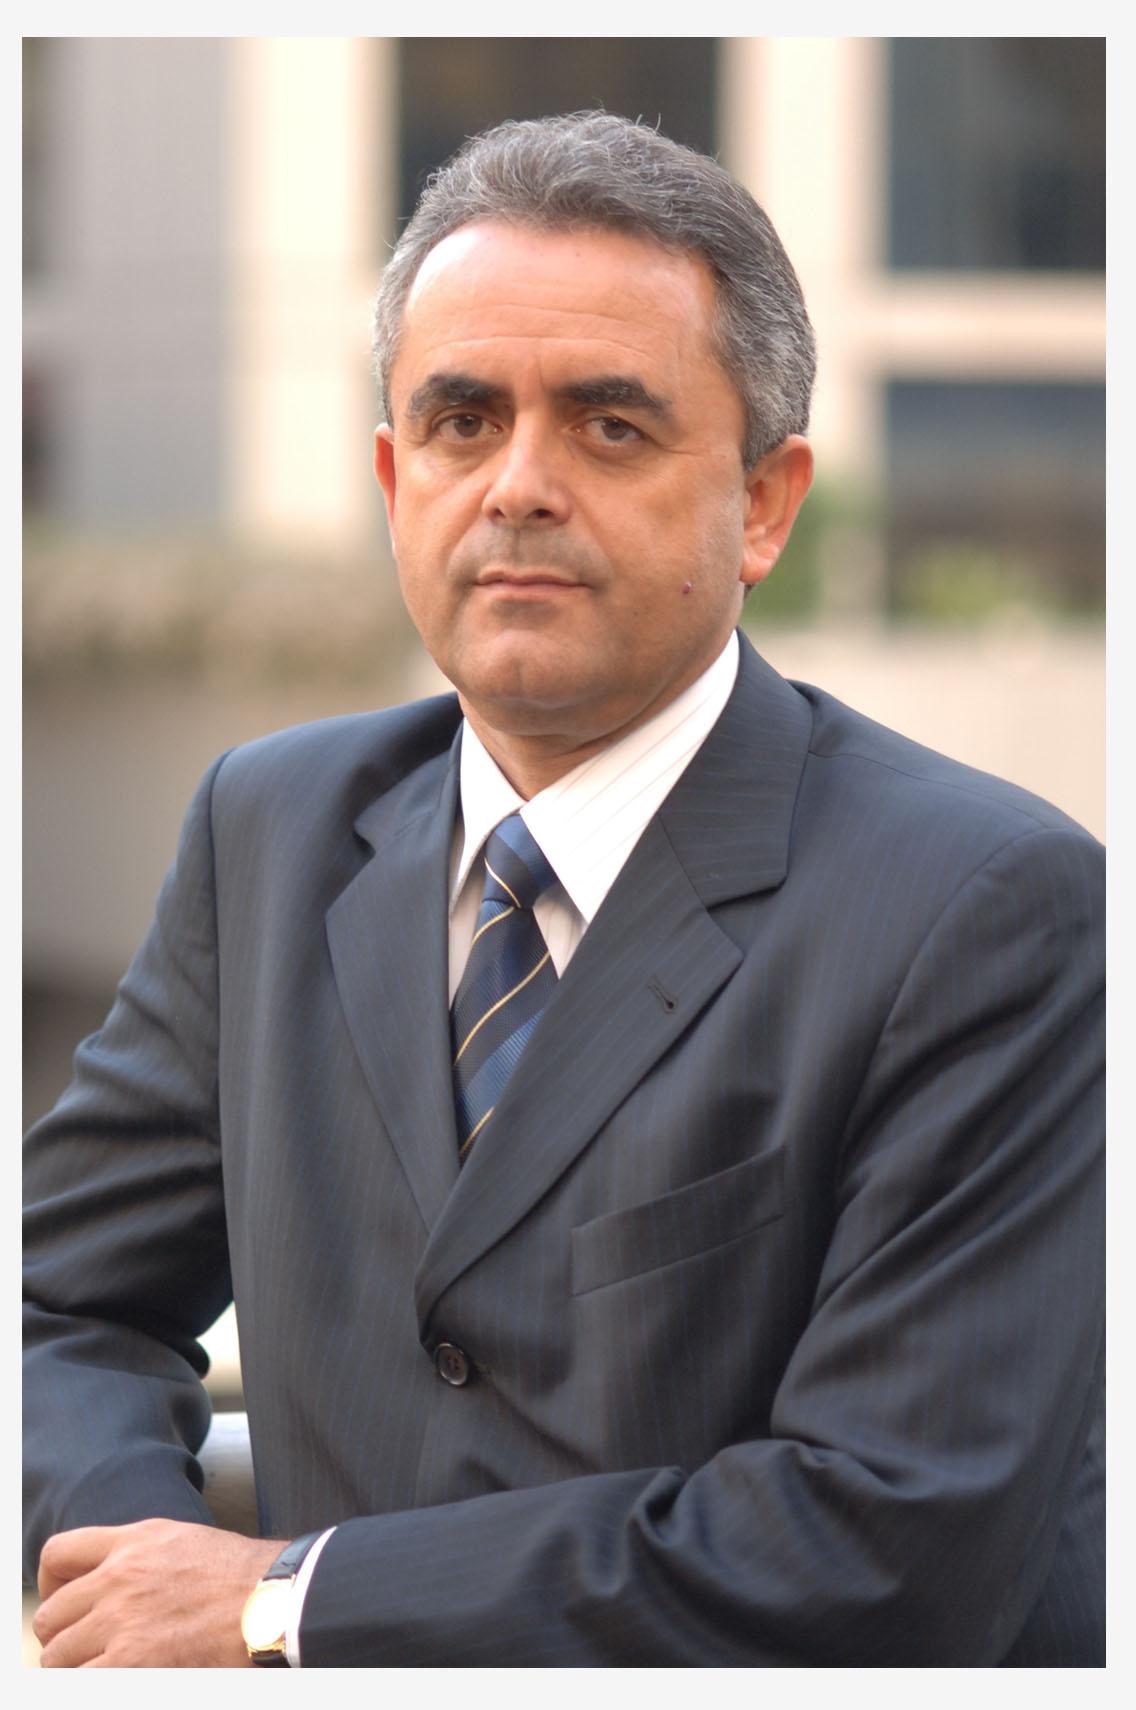 Caso Battisti; Lula; STF; Extradição; Itália; Crime Político;